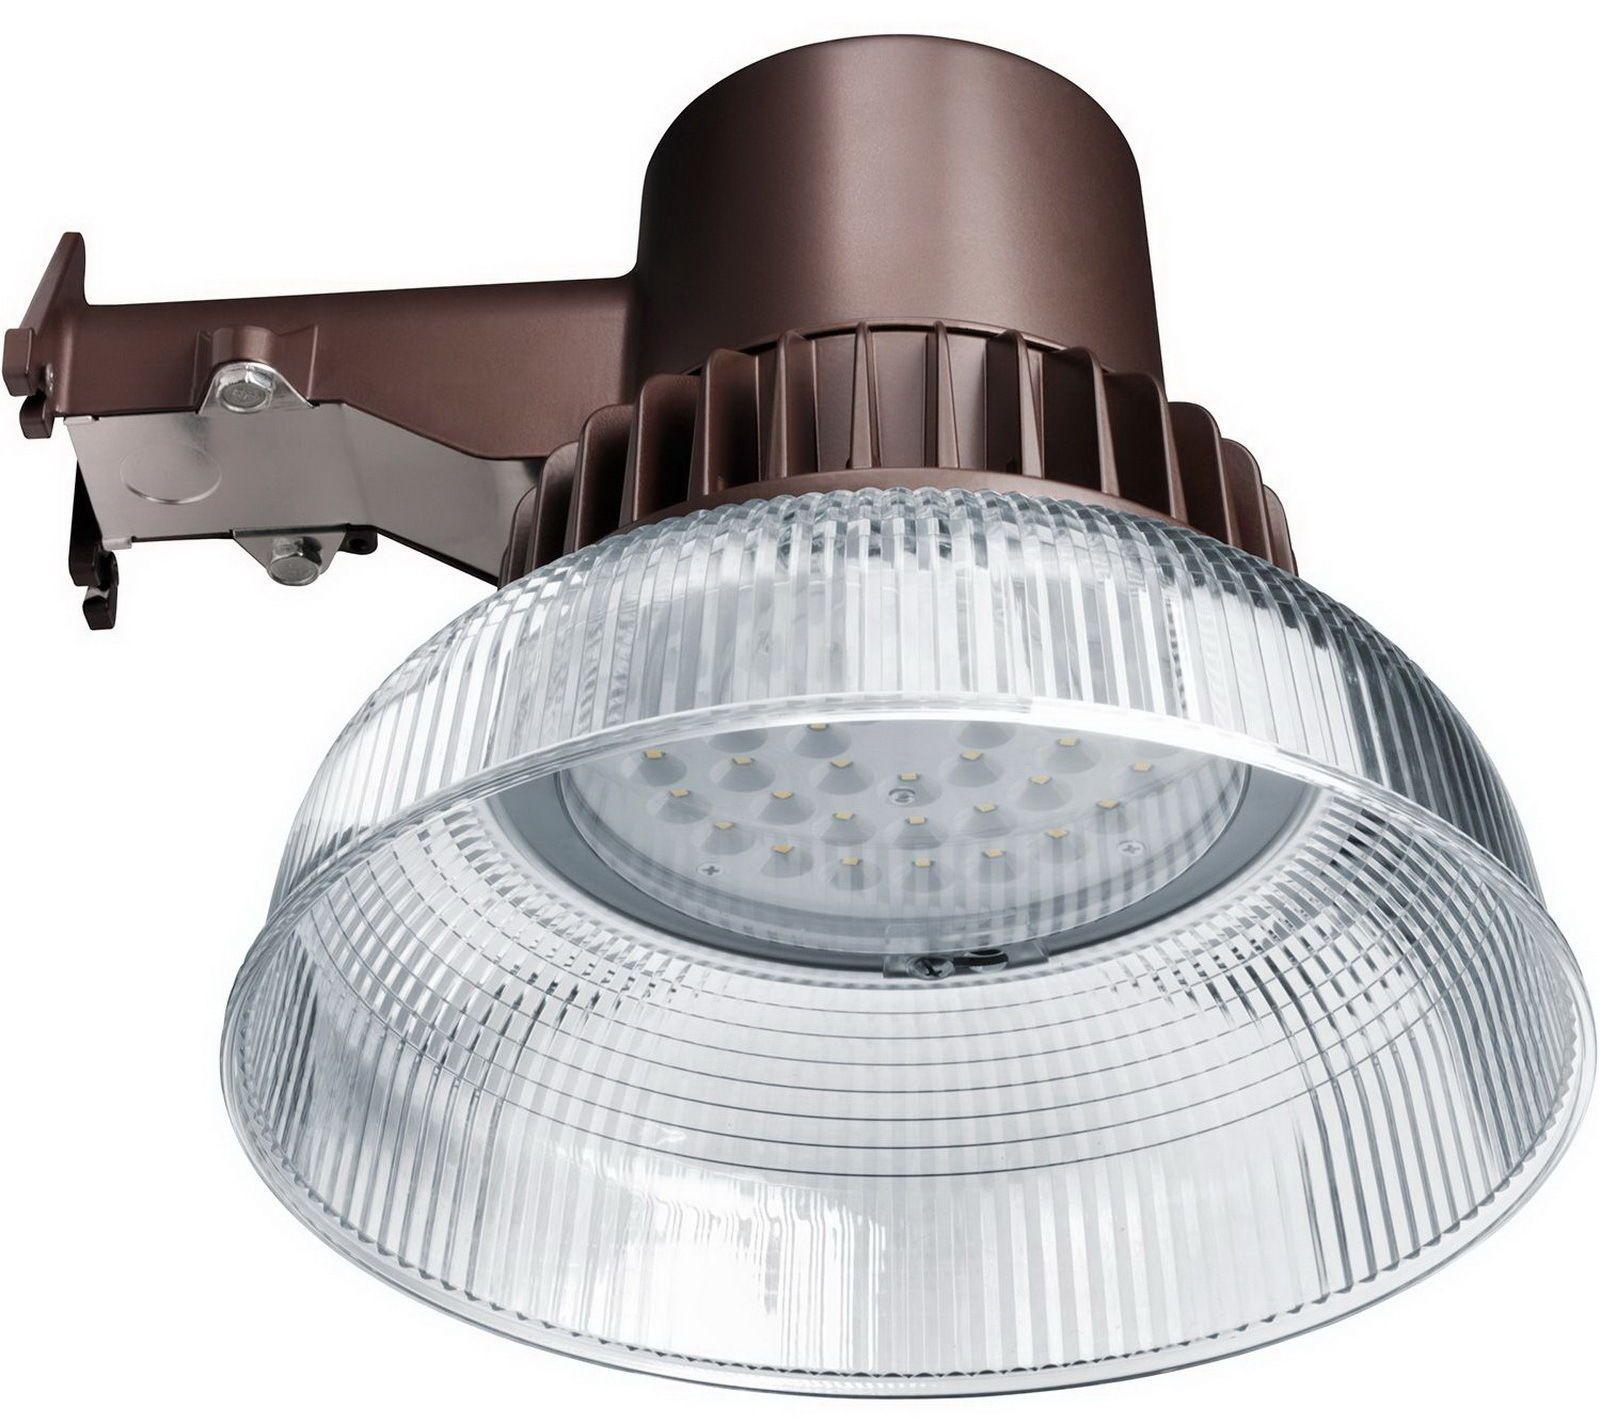 Honeywell Outdoor Led Security Light 3500 Lumen Dusk To Dawn Wall Lamp Security Lights Barn Lighting Outdoor Light Fixtures